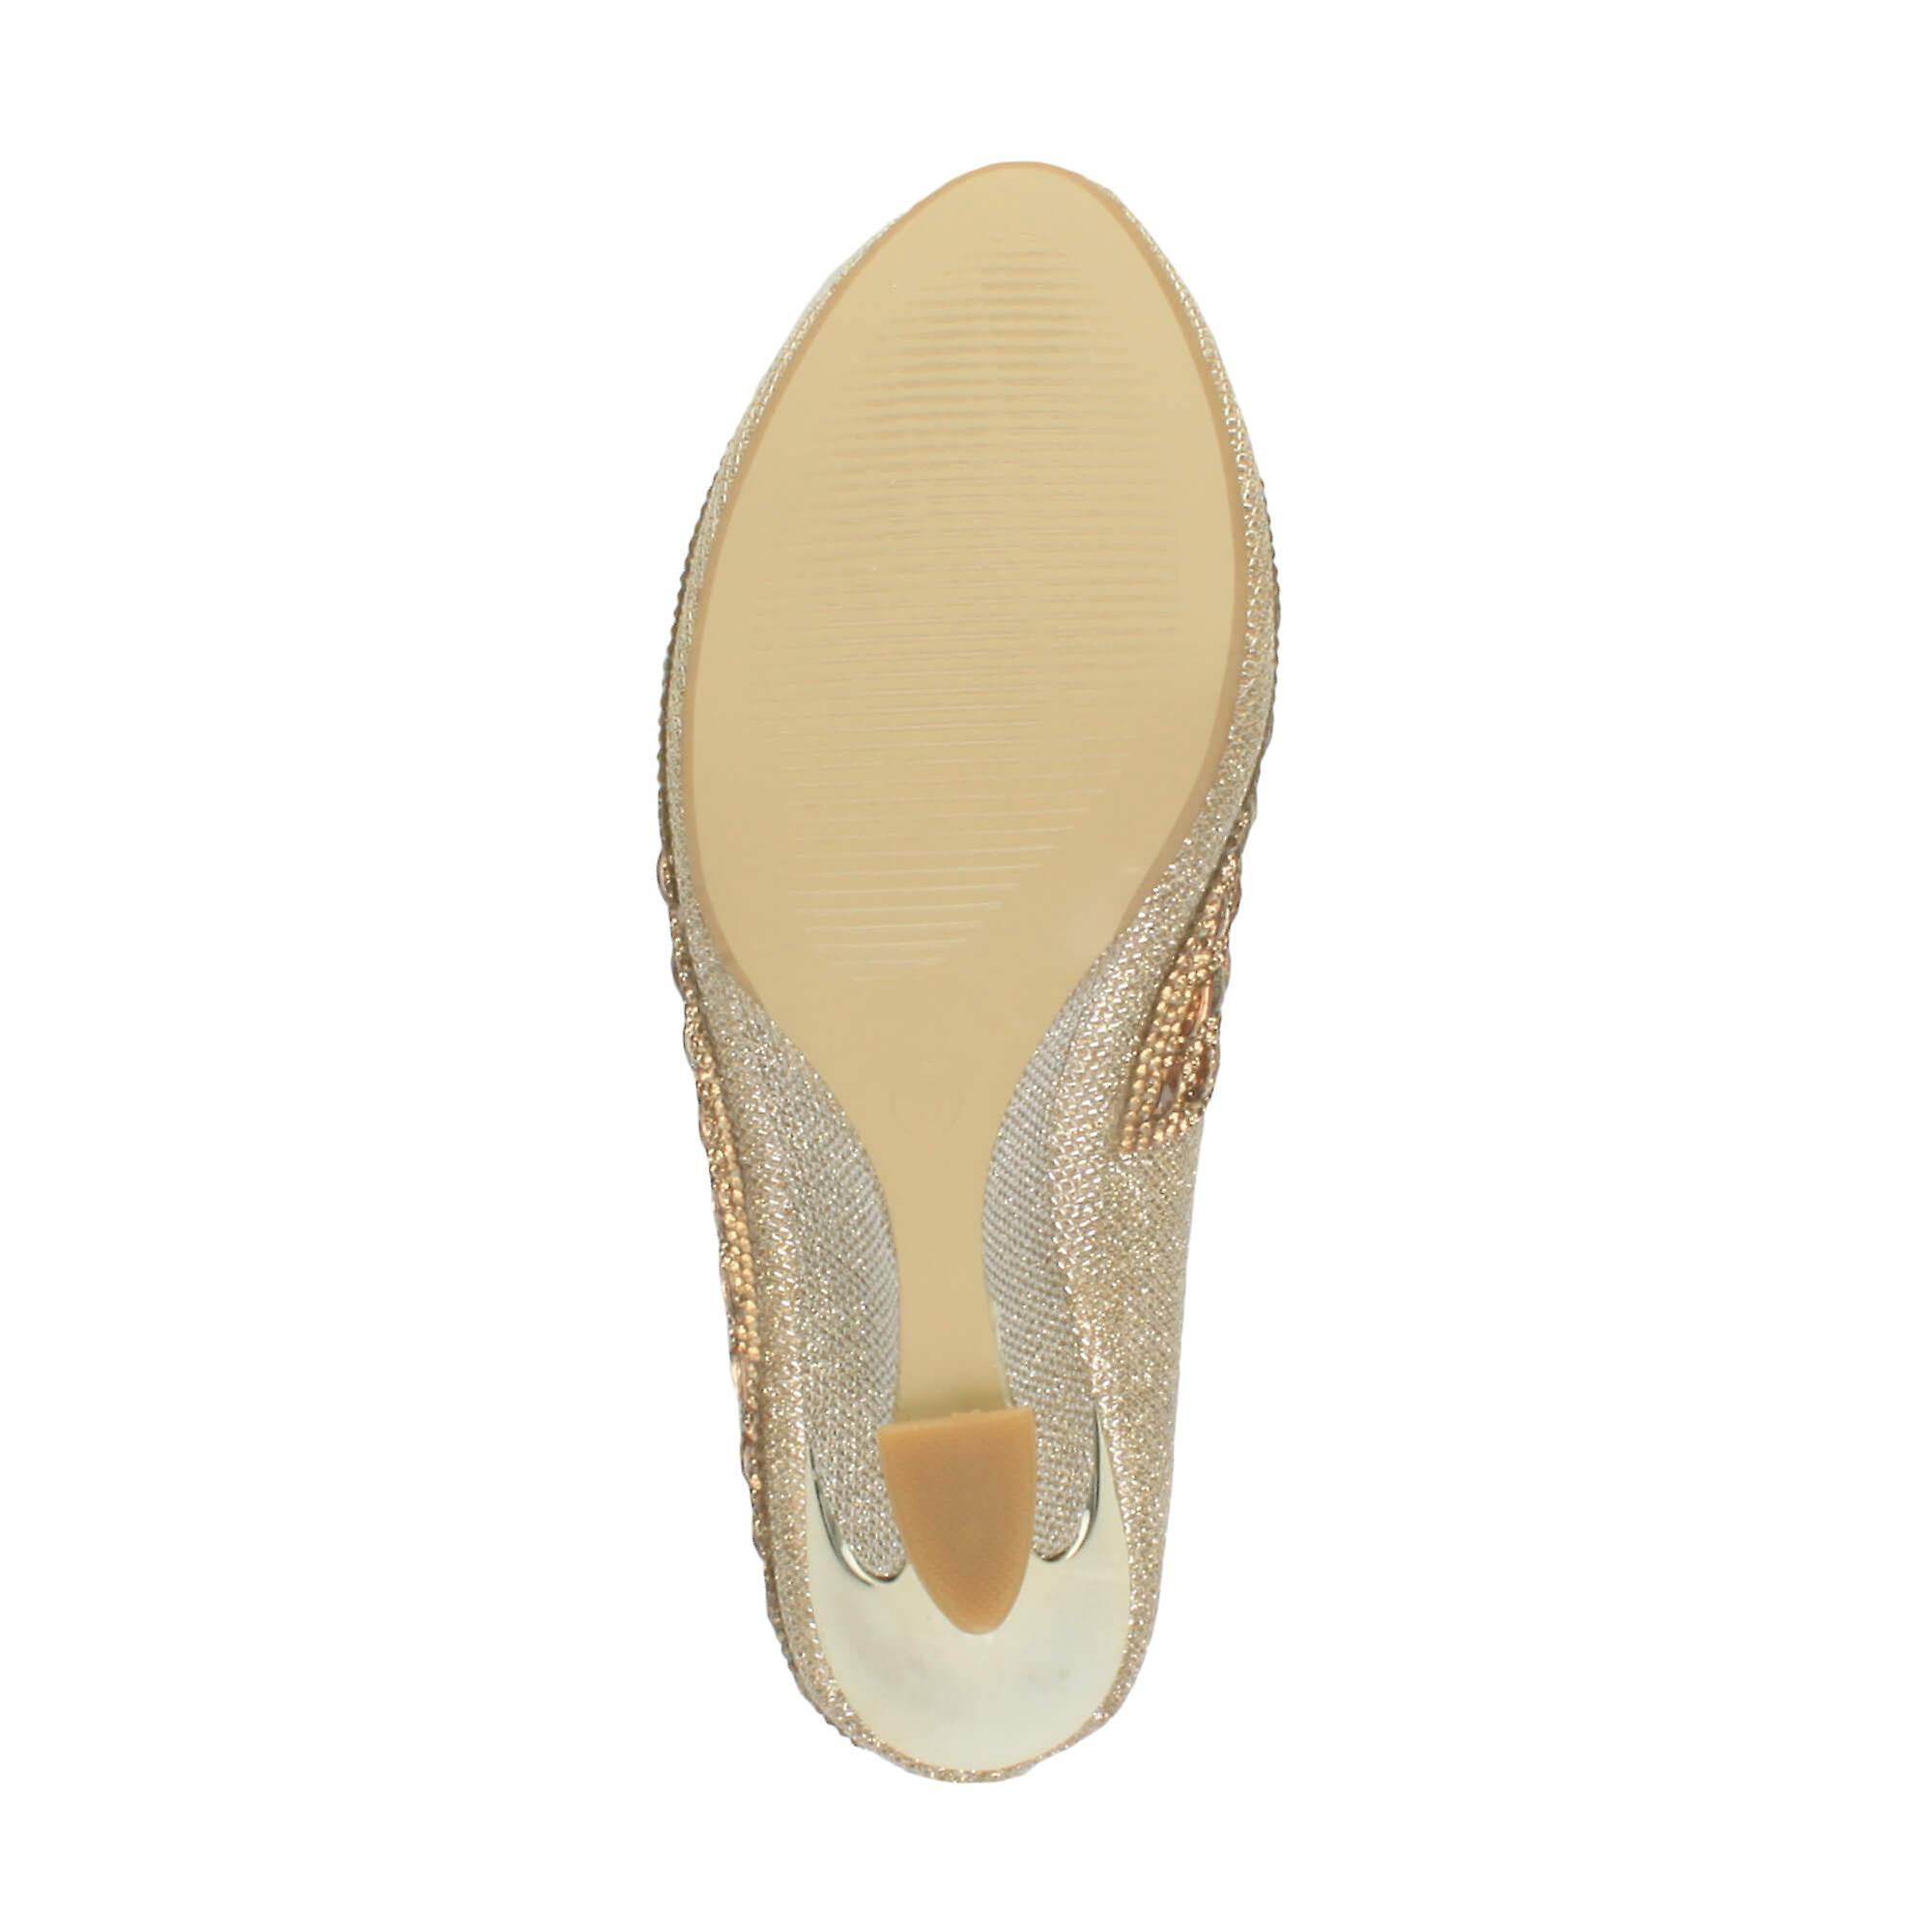 Ajvani donna mid heel wedge wedge wedge platform diamante evening bridal wedding prom court scarpe pumps | prezzo di sconto speciale  | Gentiluomo/Signora Scarpa  e25b05